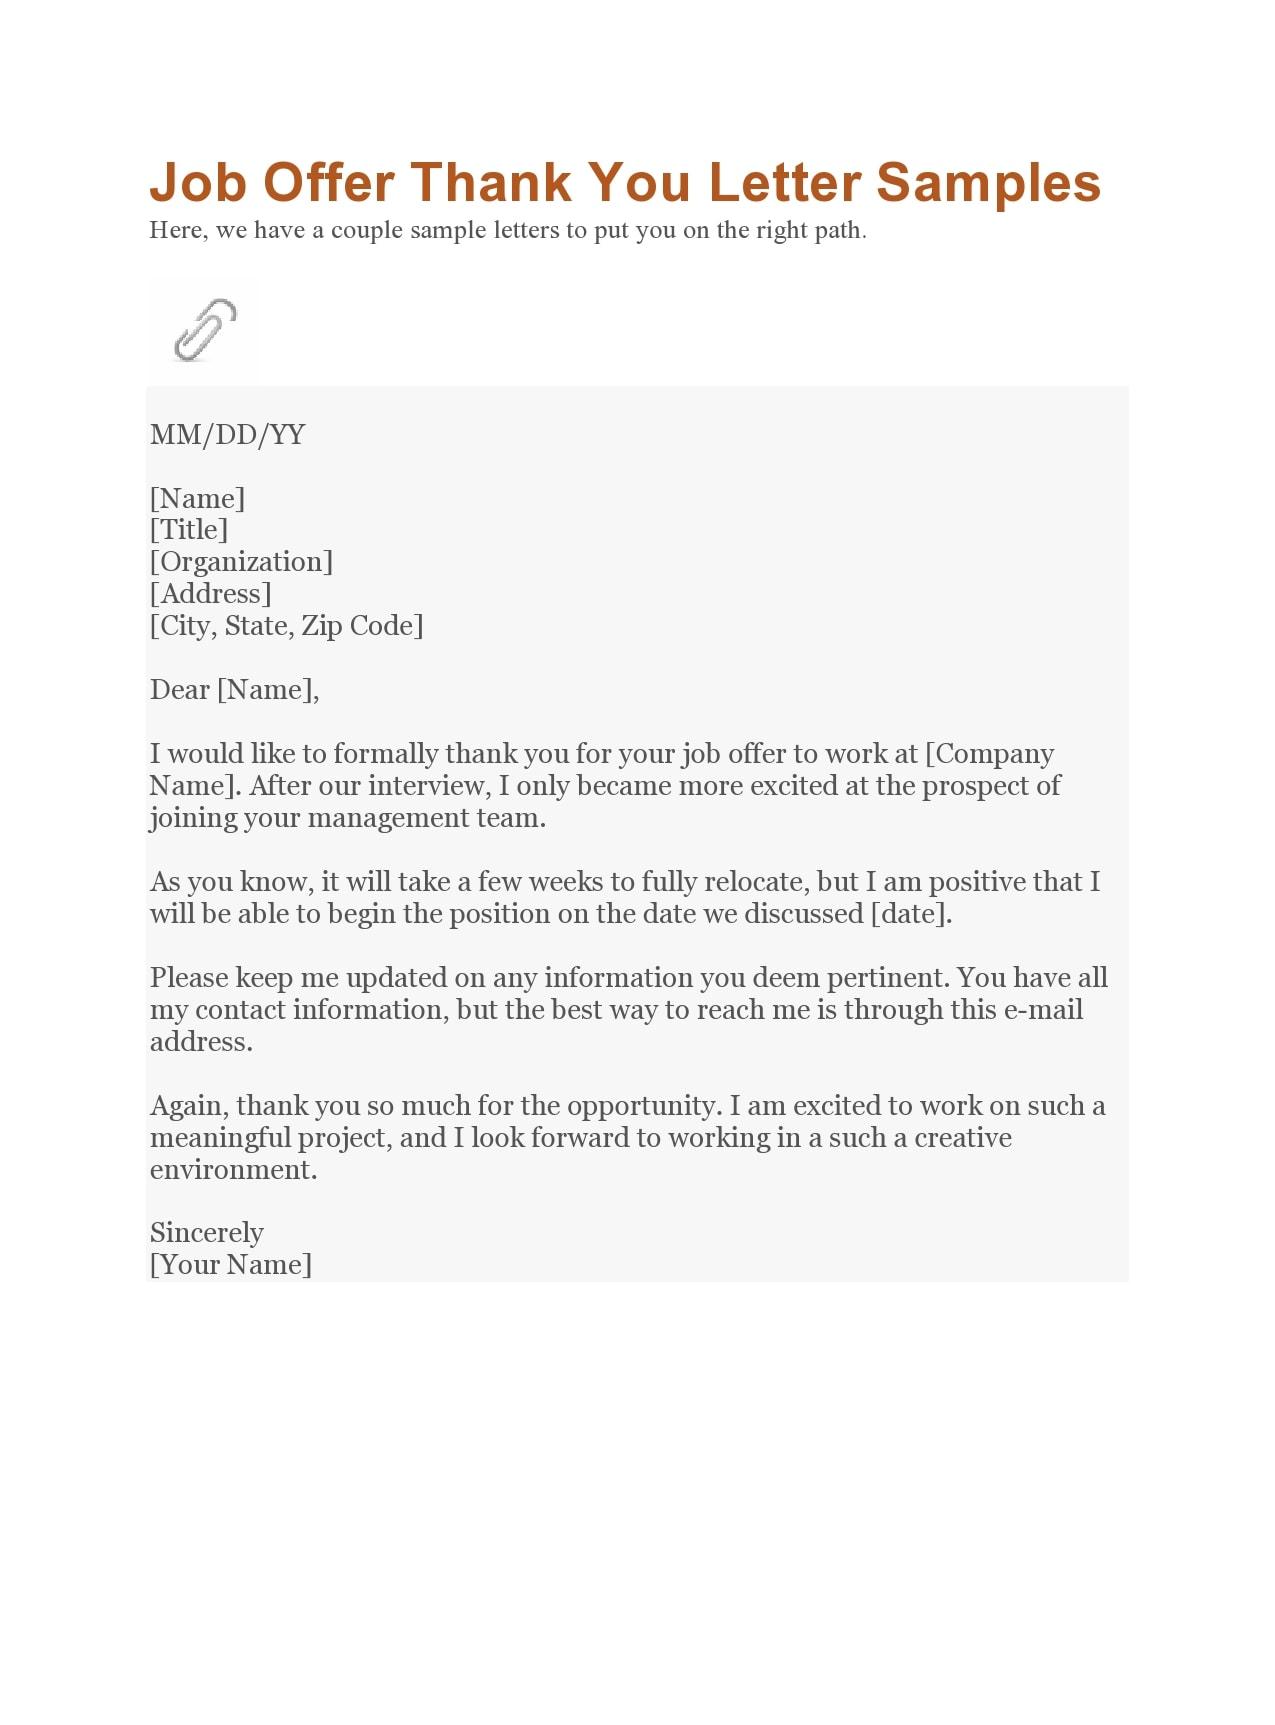 thank you letter for job offer 22